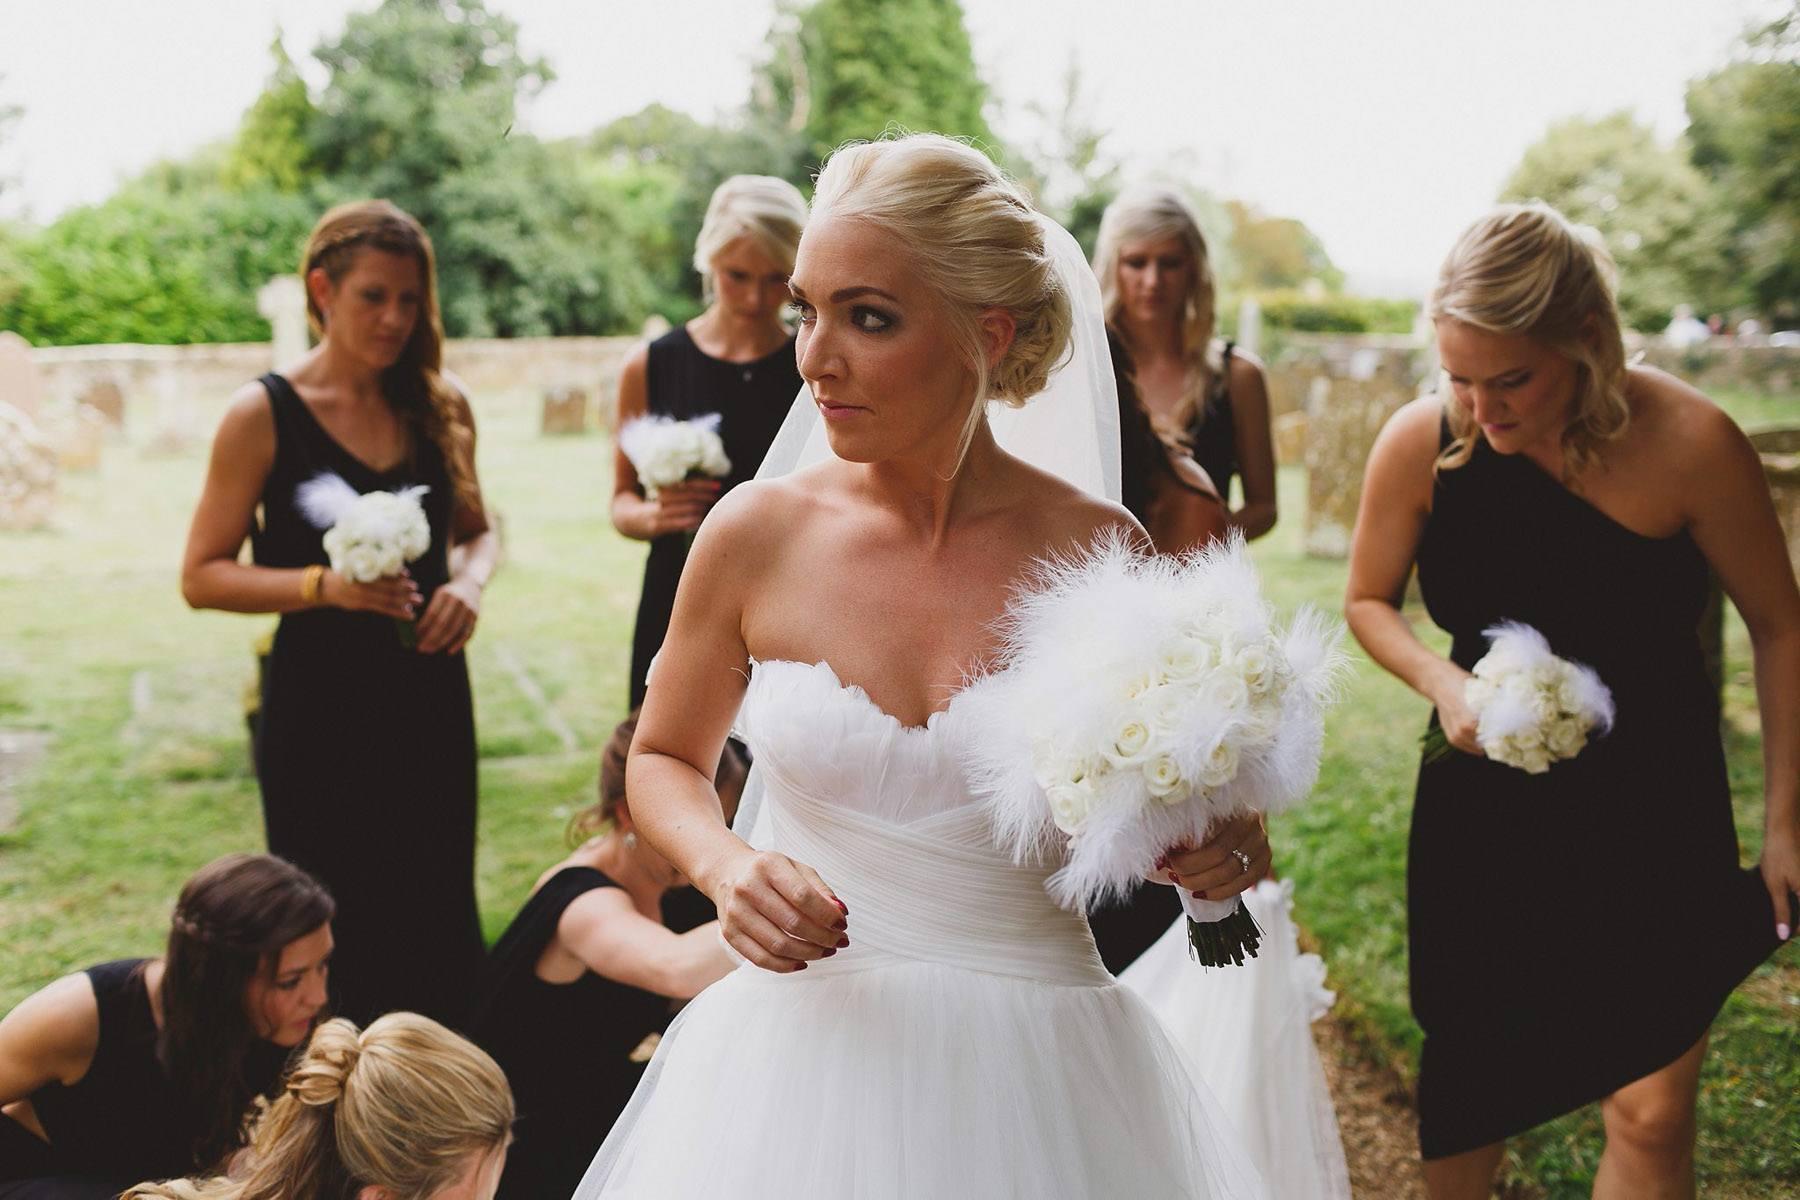 oxfordshire-wedding-photographer-026